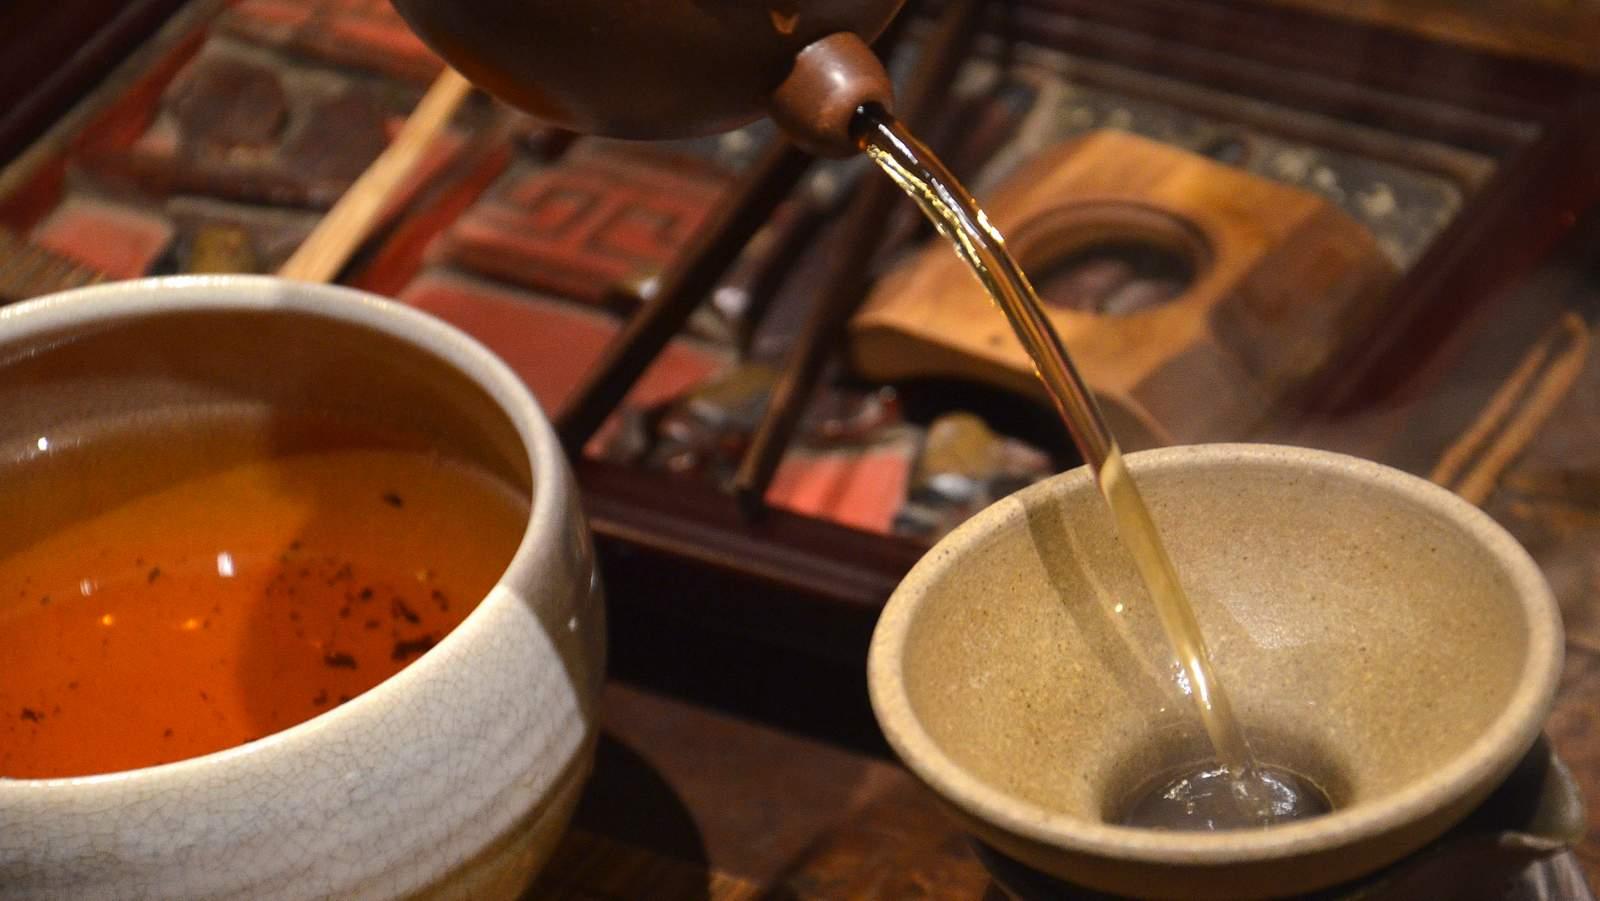 CNNP raw Pu-erh blend 7542, red label from 1996 of Menghai tea factory, more than ten rounds